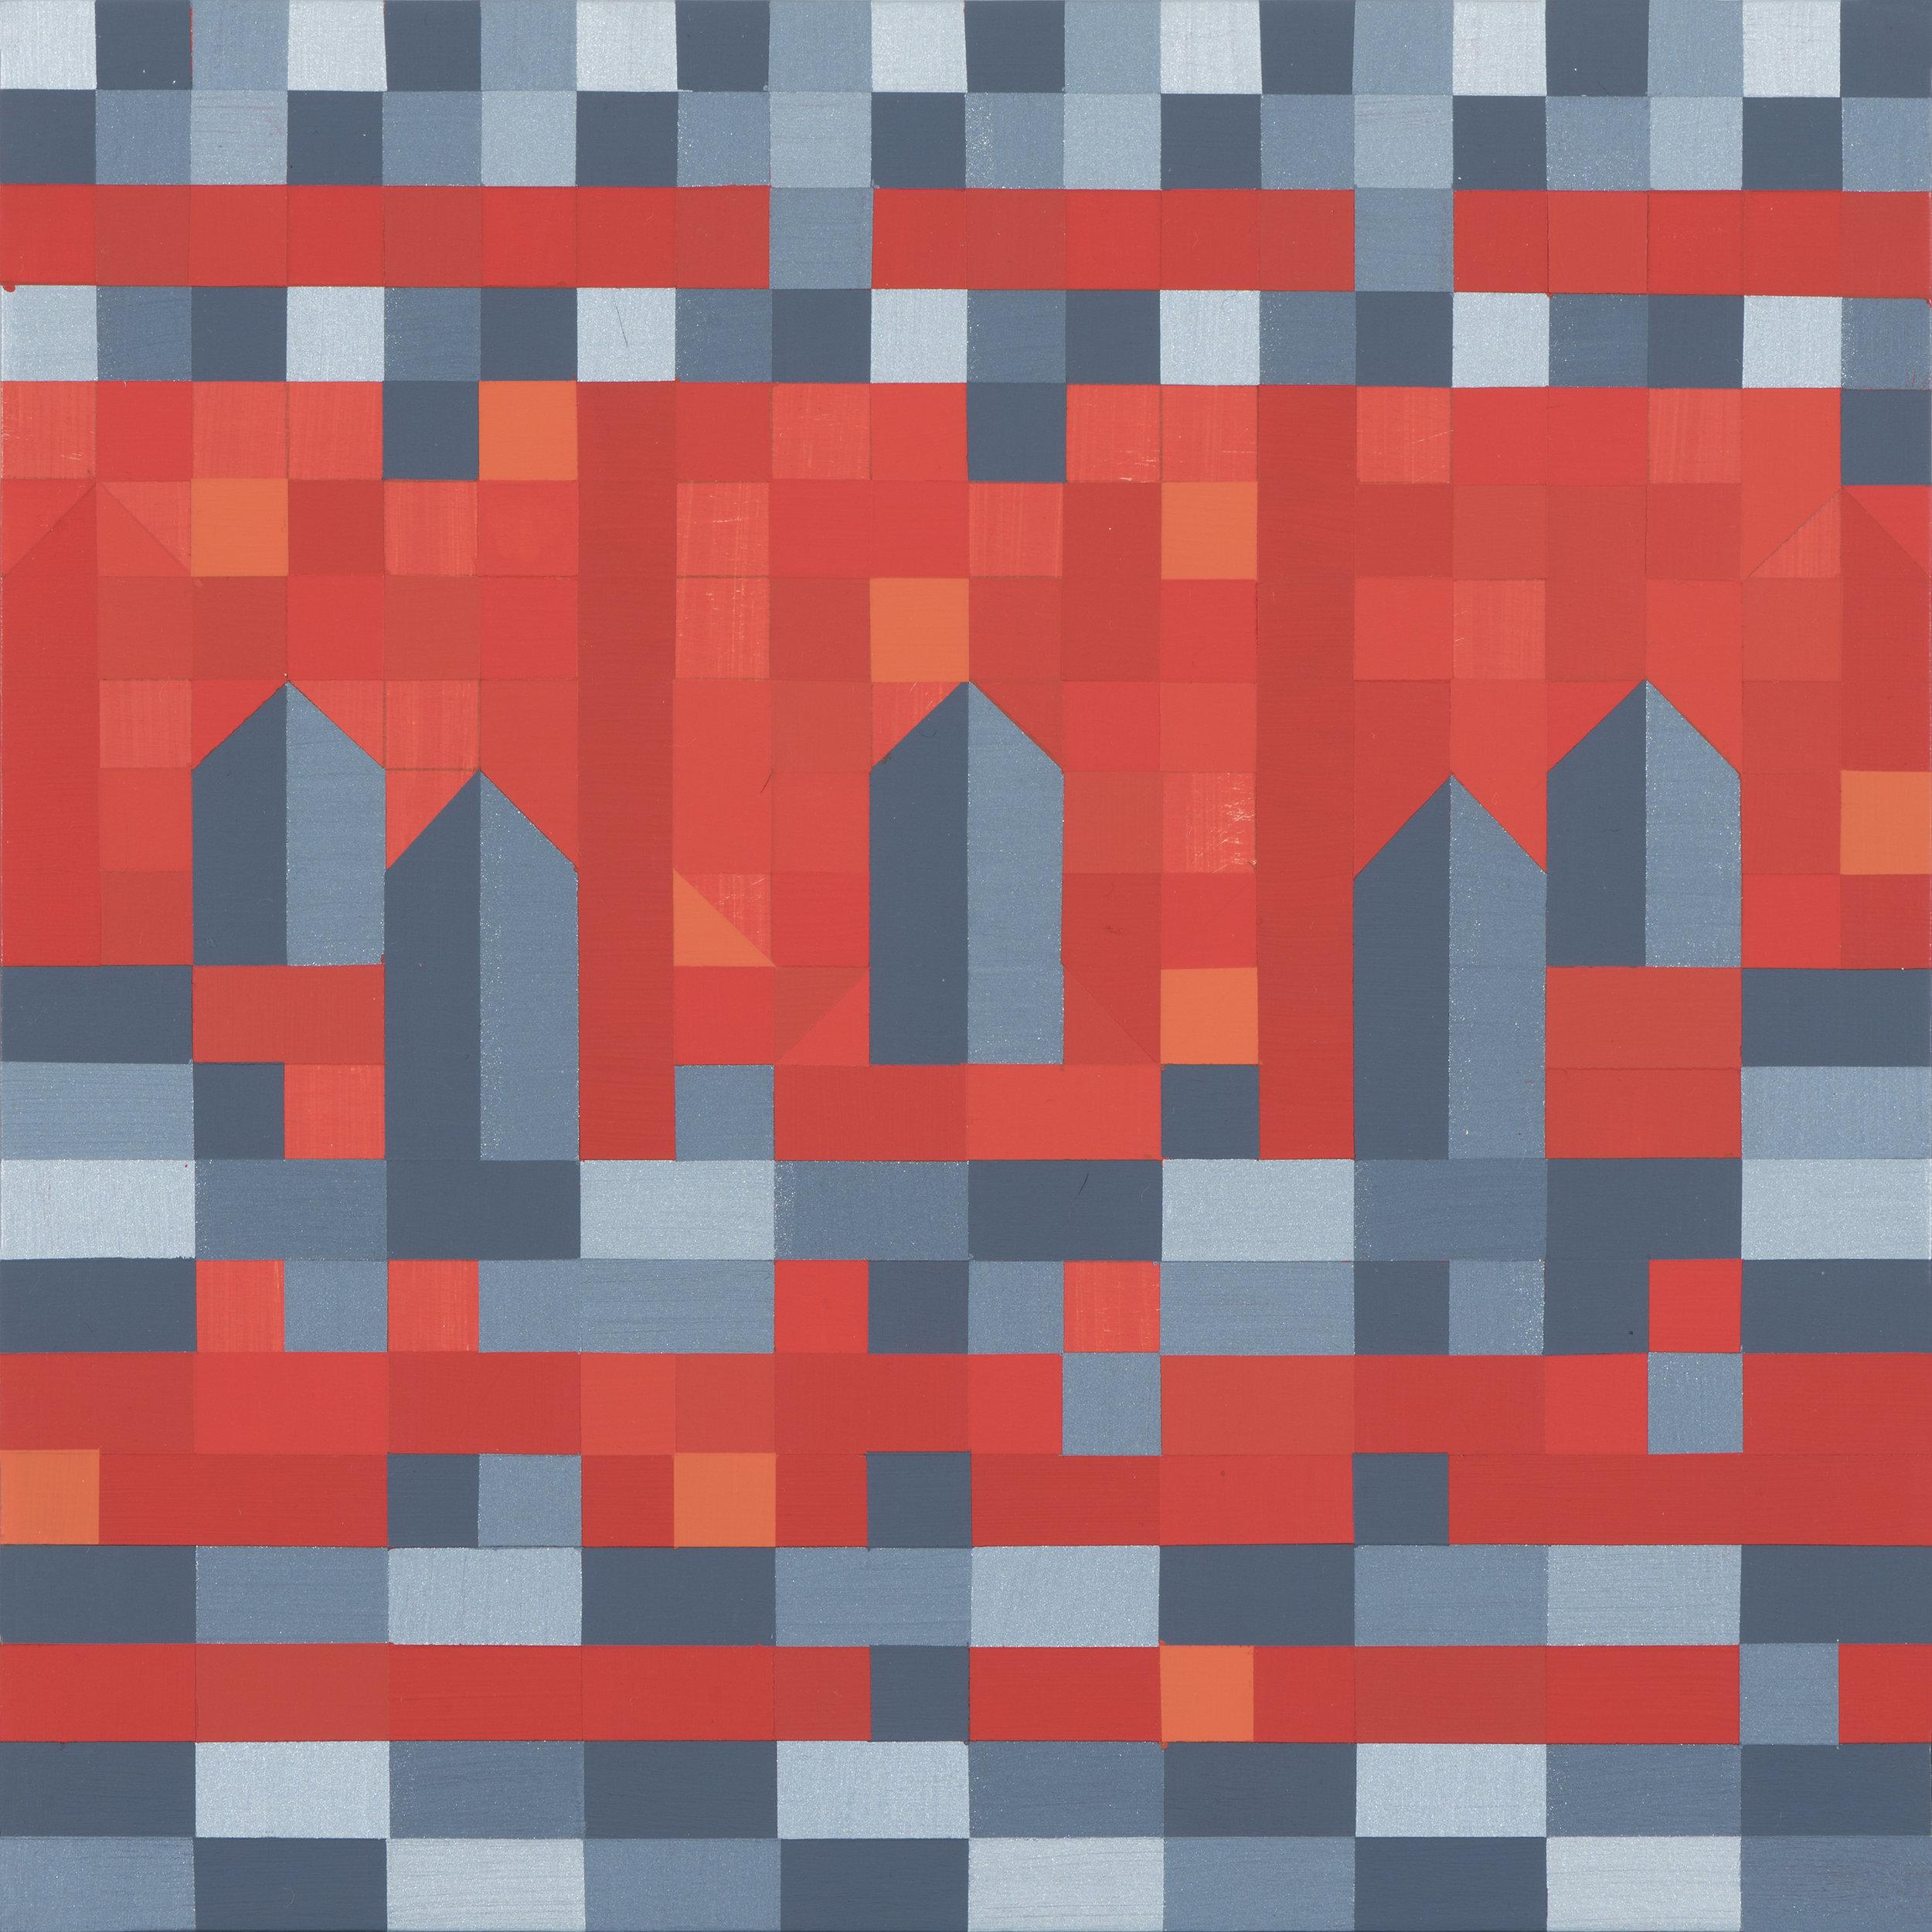 Pixelate + Dissipate